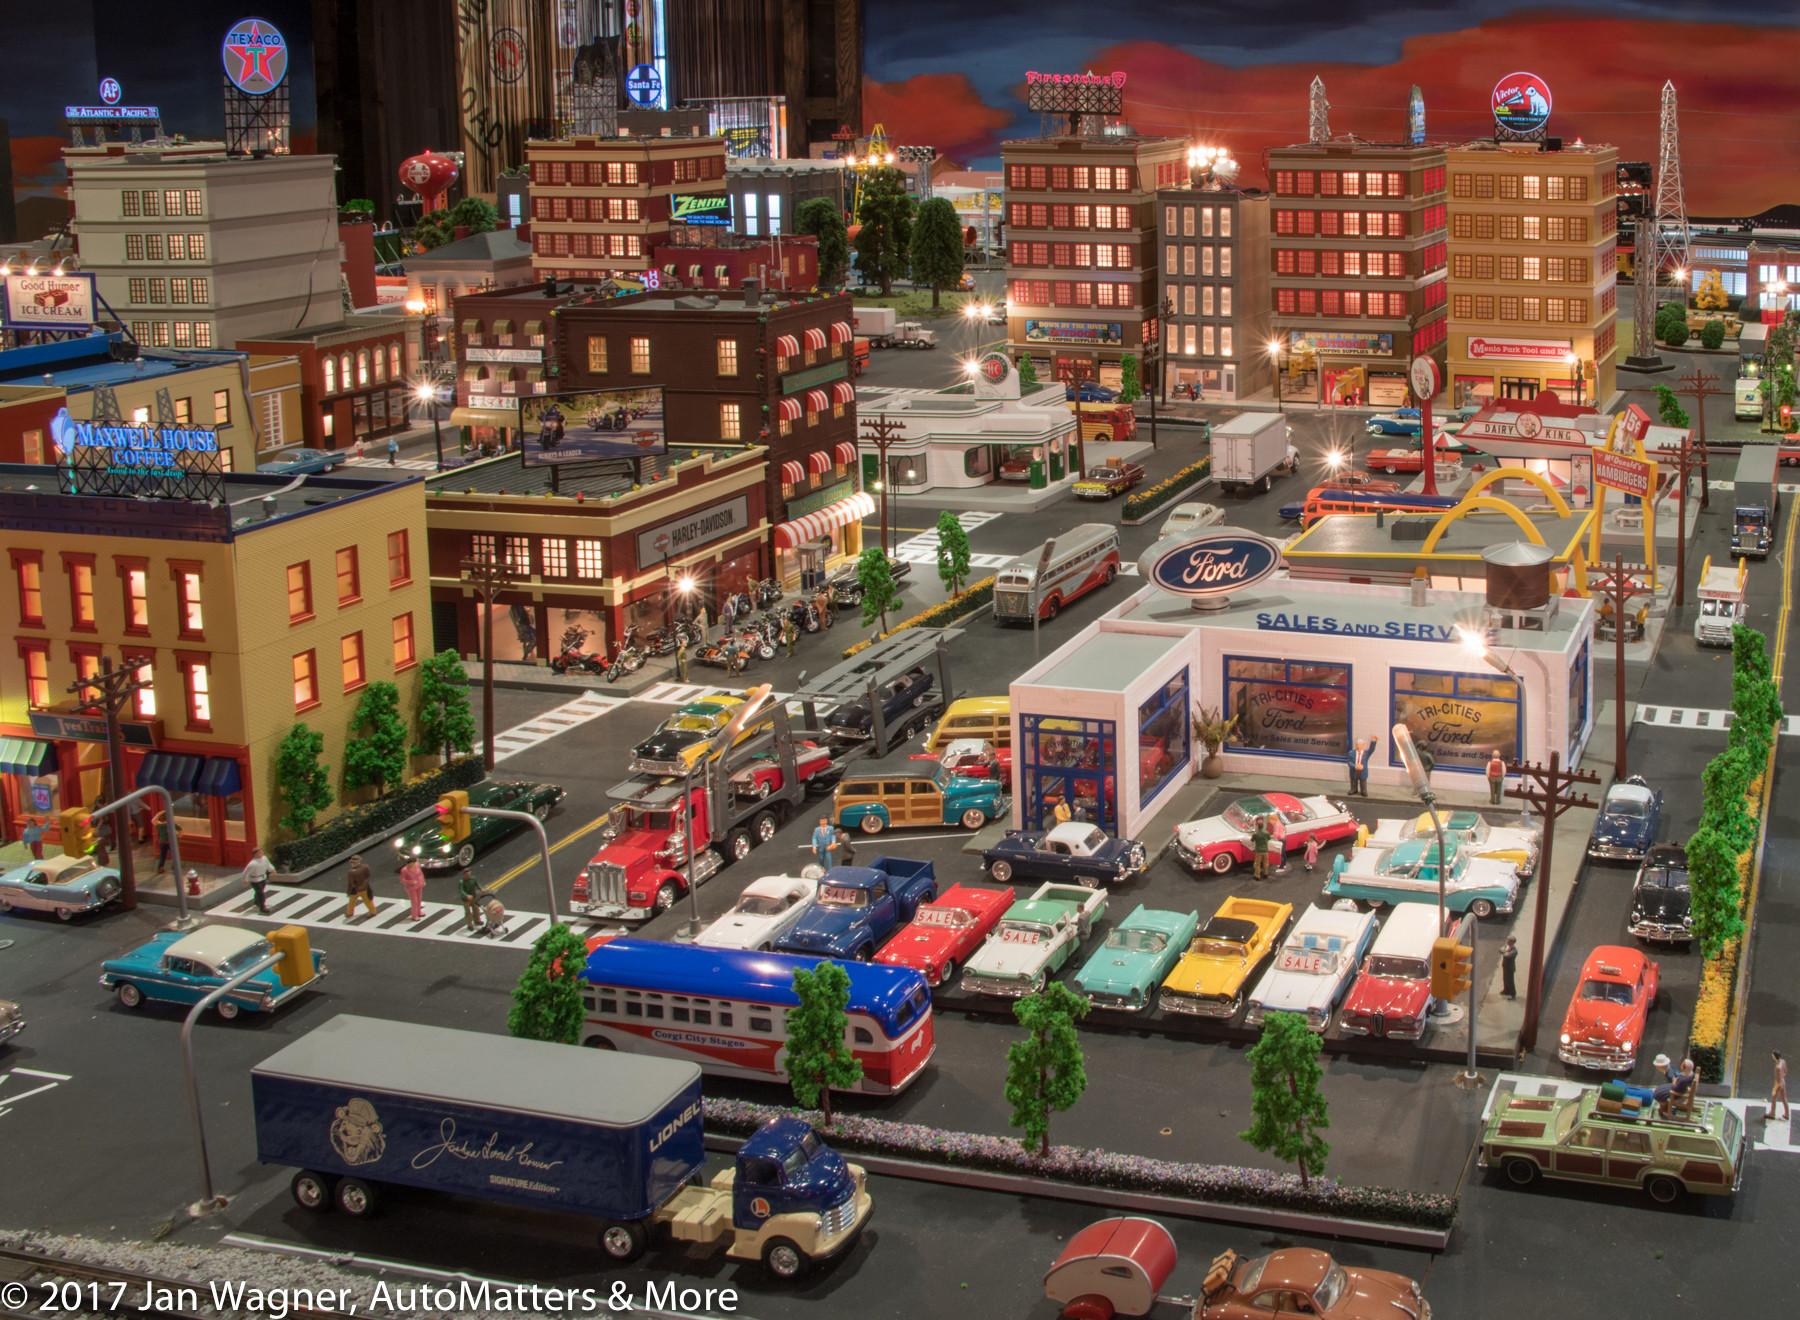 Huge city scene in miniature.